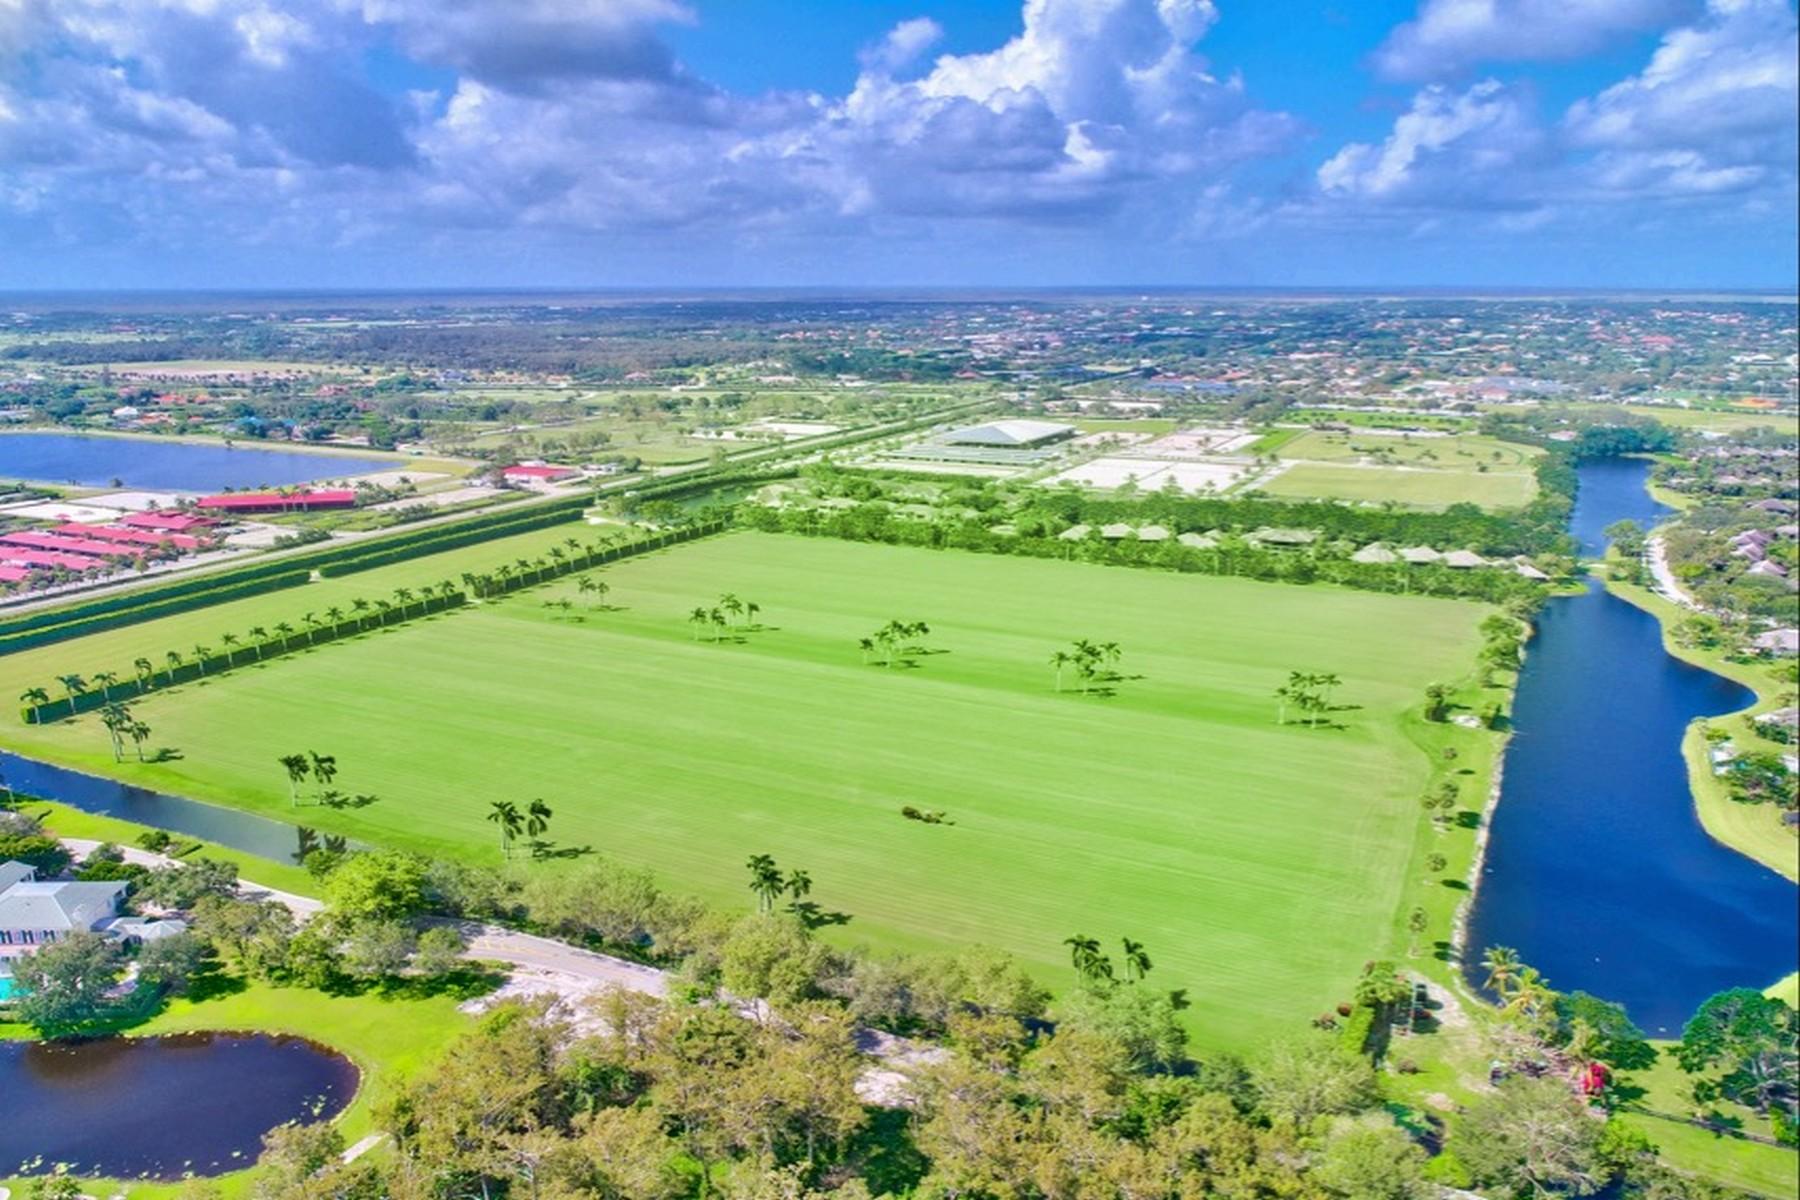 Land for Sale at 13488 S Shore Blvd Wellington, Florida 33414 United States